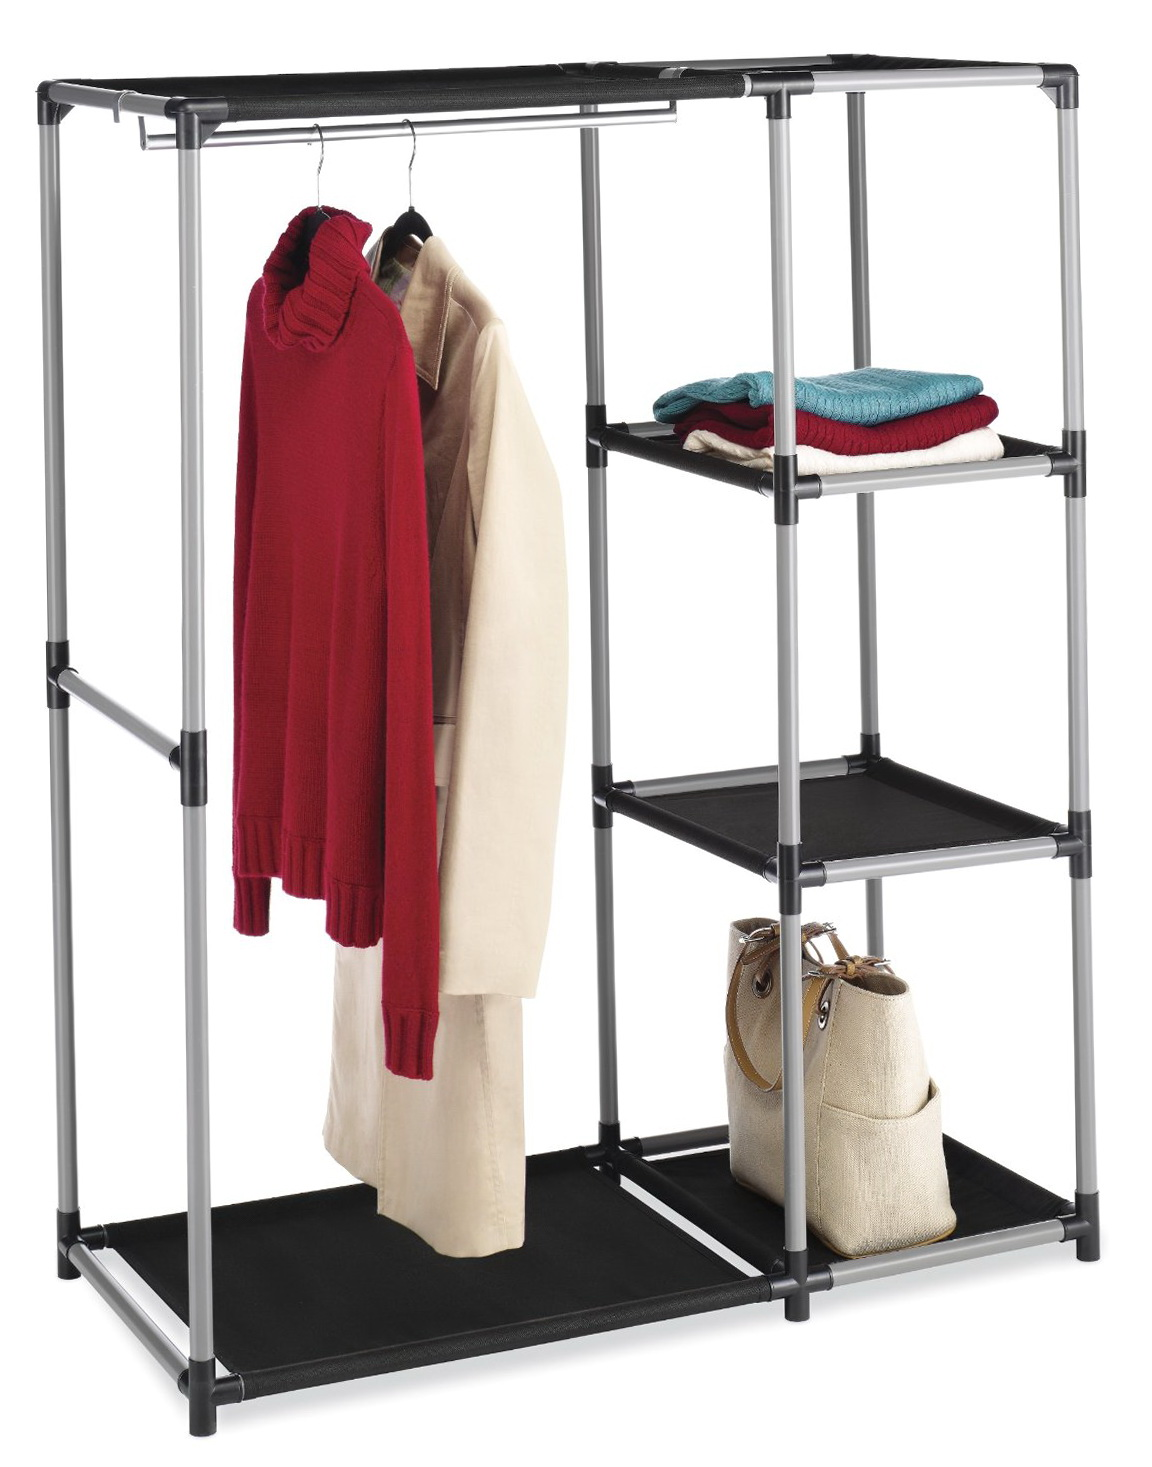 portable closet rack home depot home design ideas. Black Bedroom Furniture Sets. Home Design Ideas